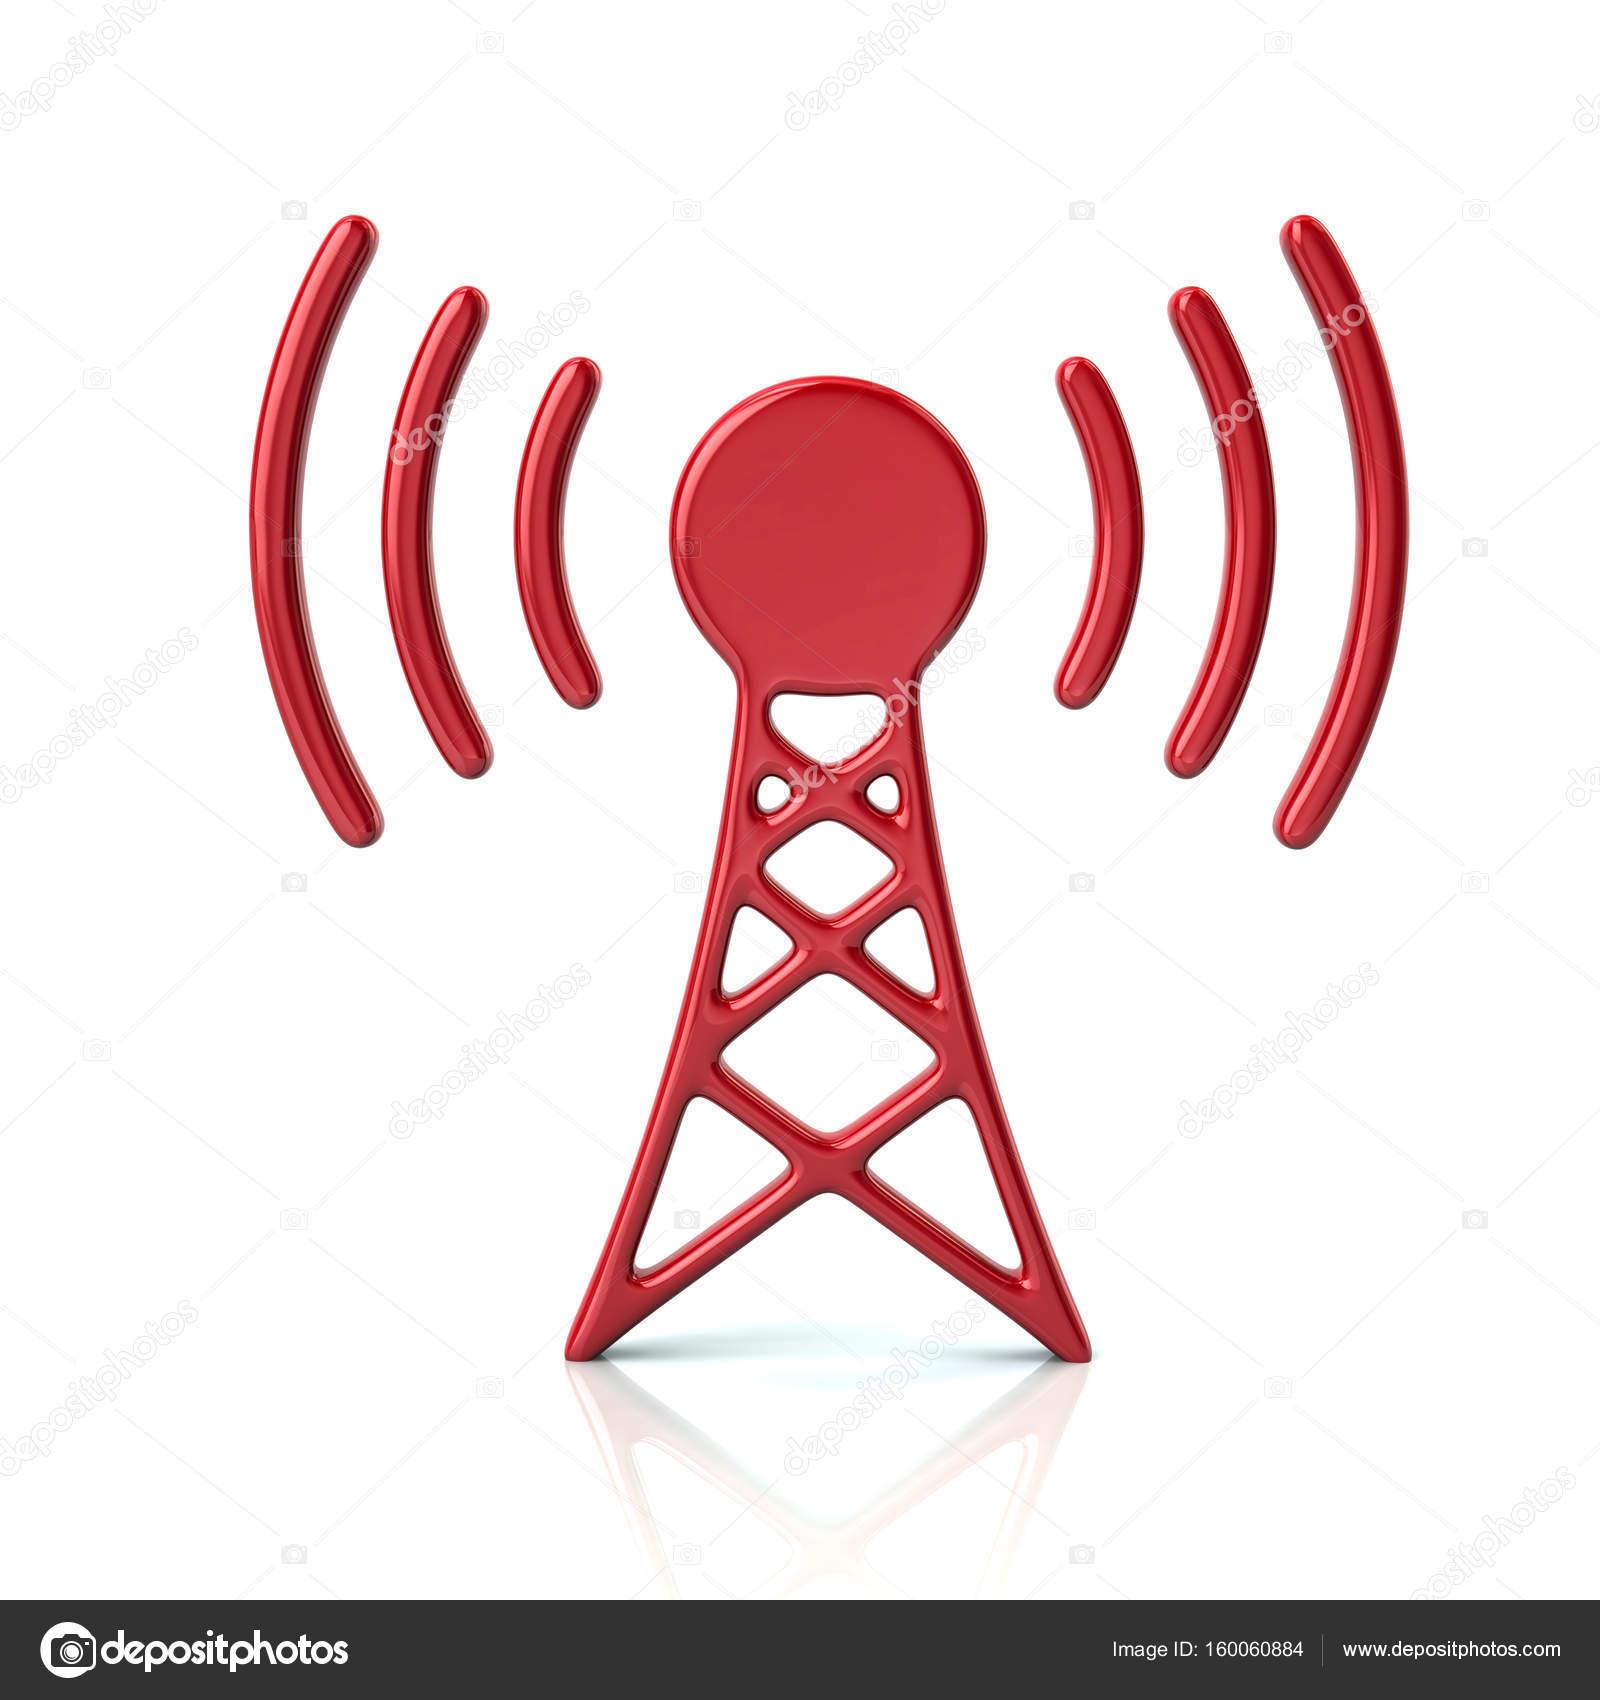 Rote Sender Turm Symbol — Stockfoto © valdum #160060884